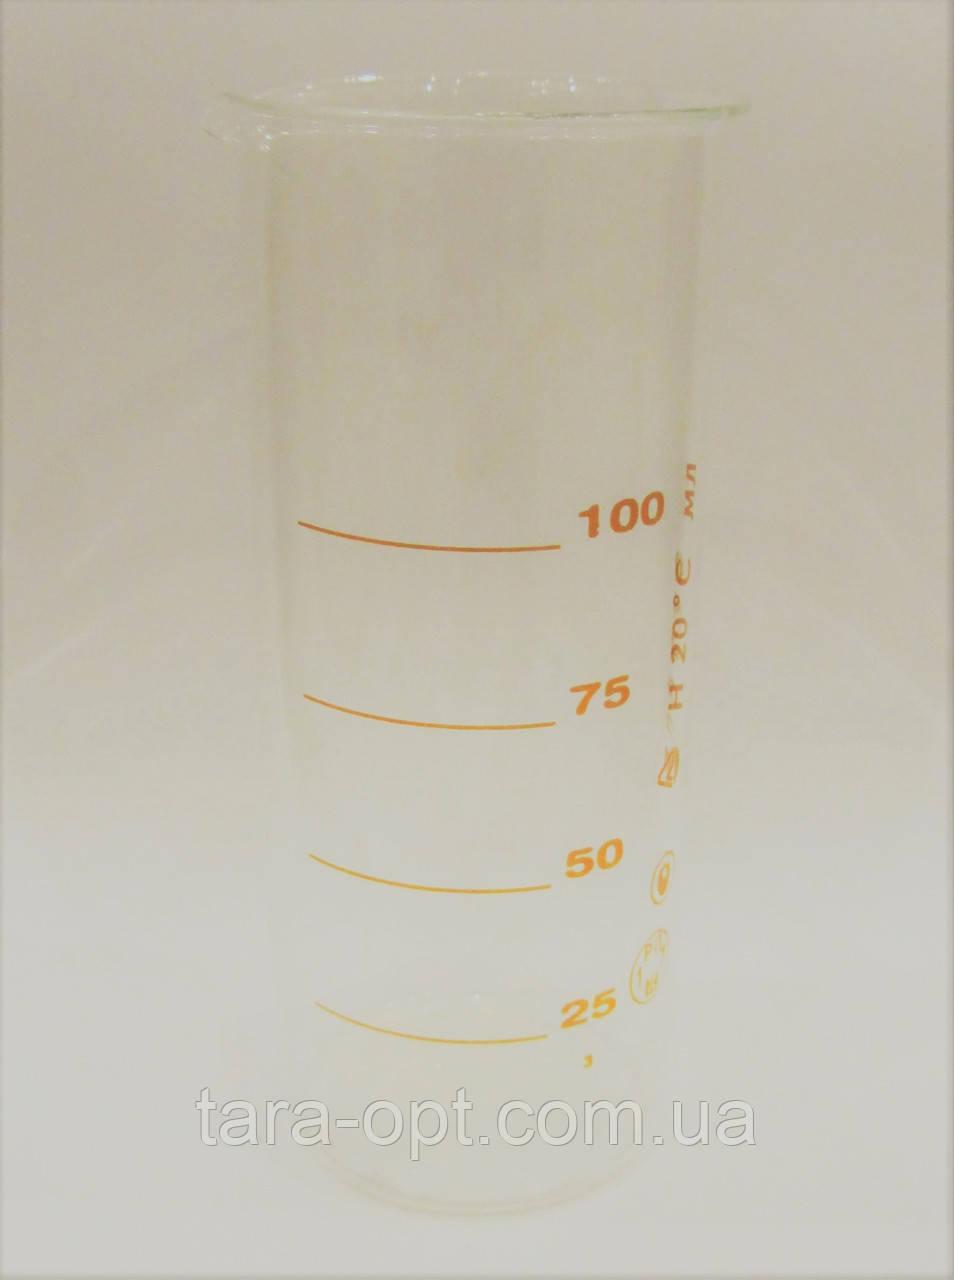 Мерная колба 100 мл стеклянный цилиндр (Цена от 45 грн)